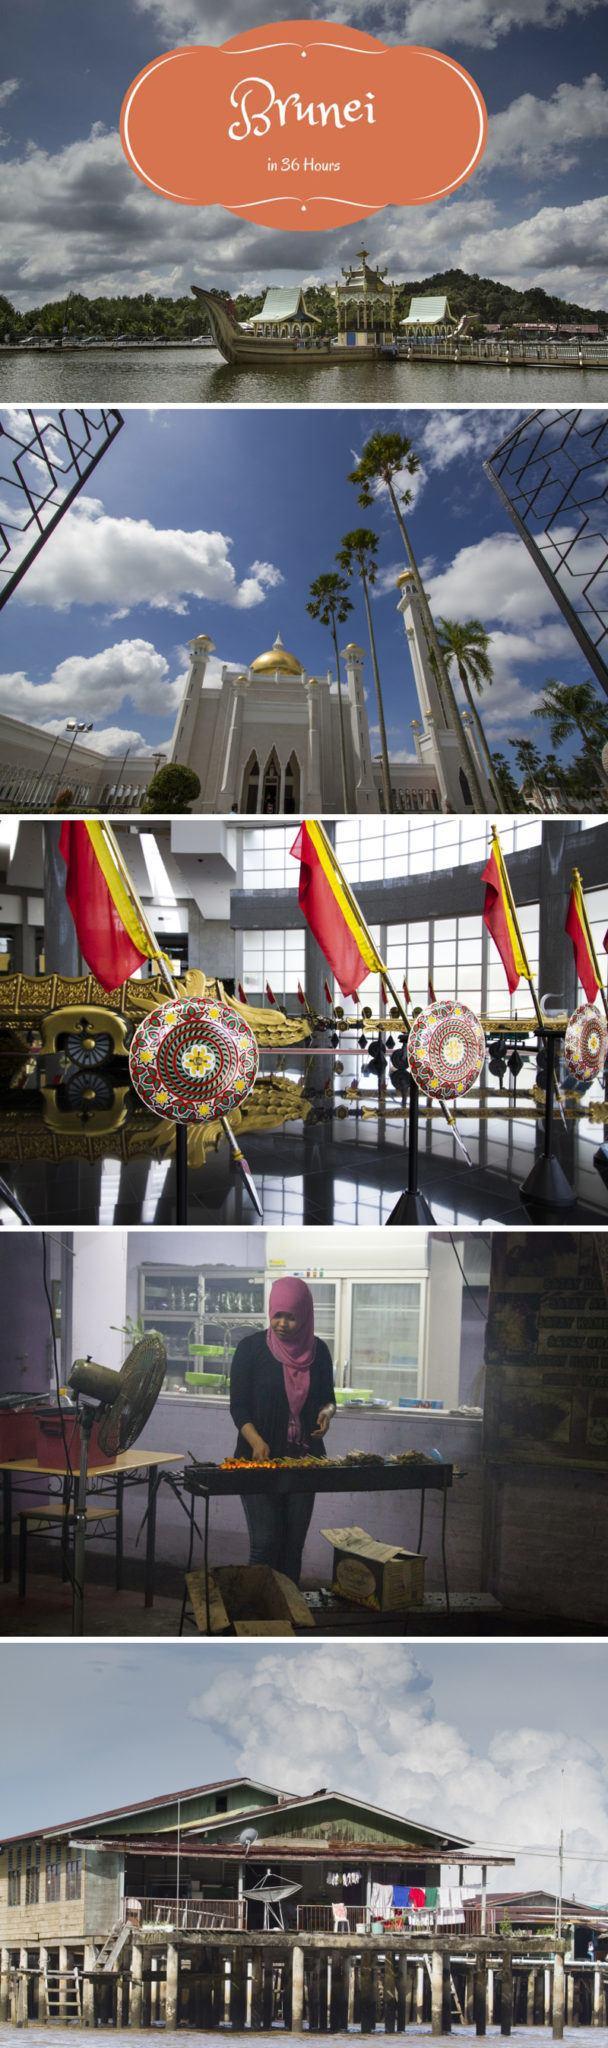 36 Hours Brunei